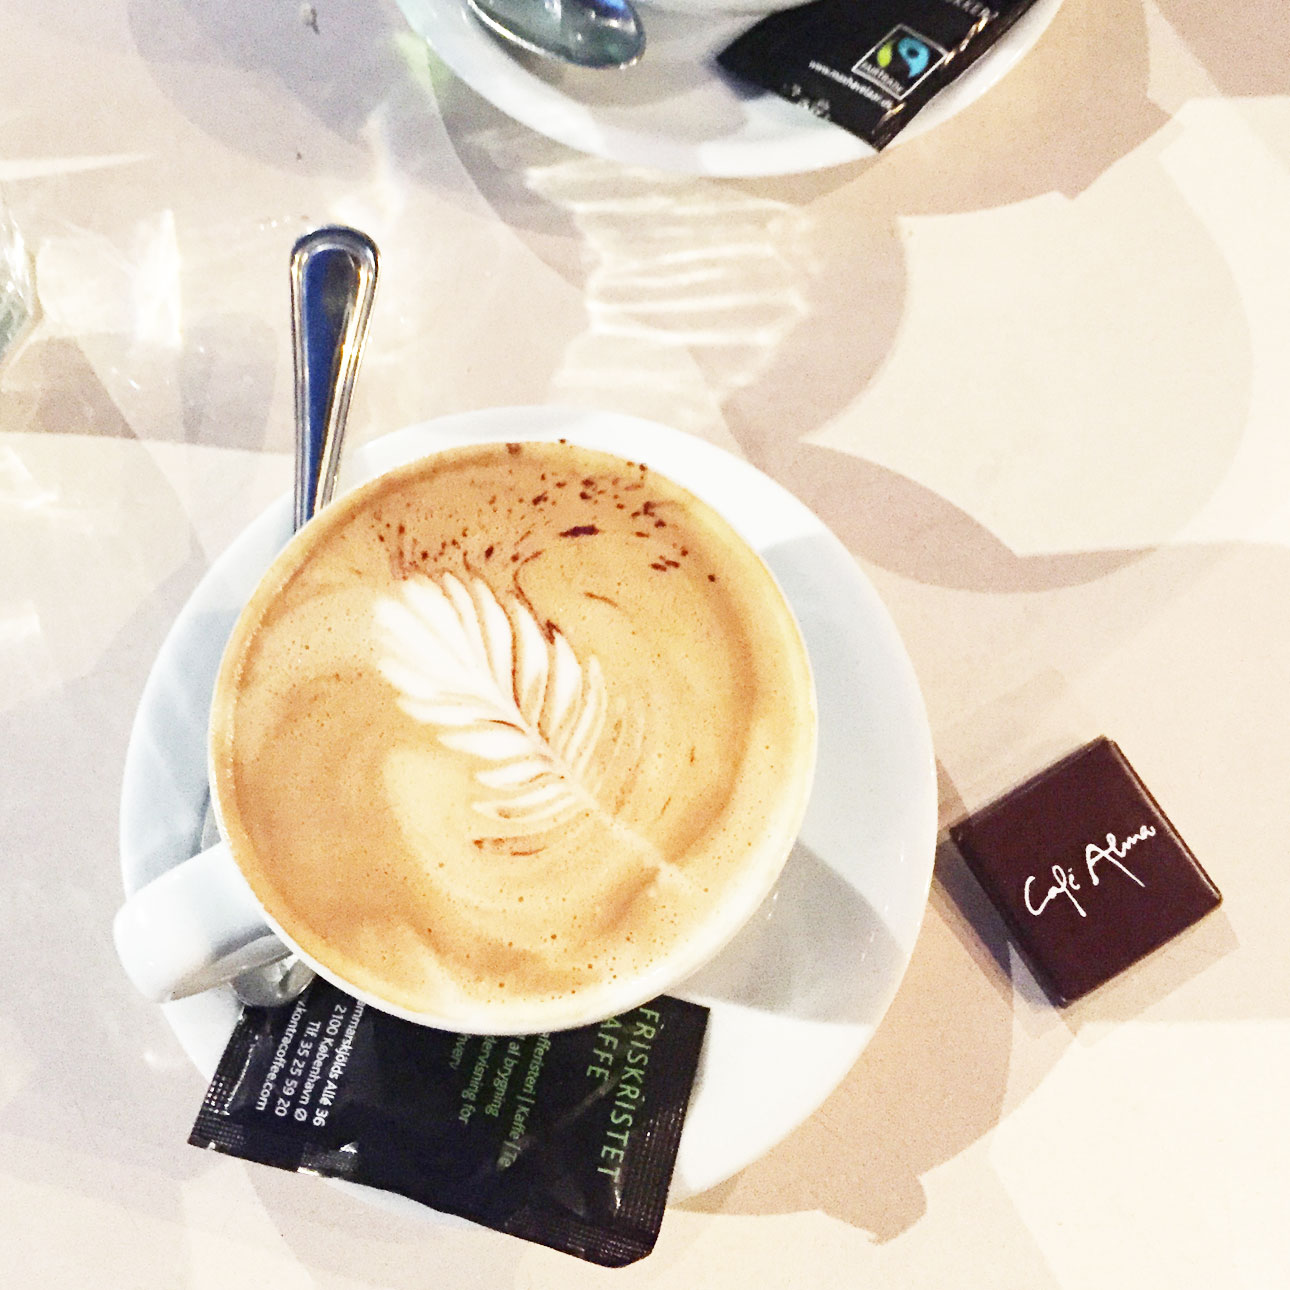 Kopenhagen hotspots cafe alma koffie